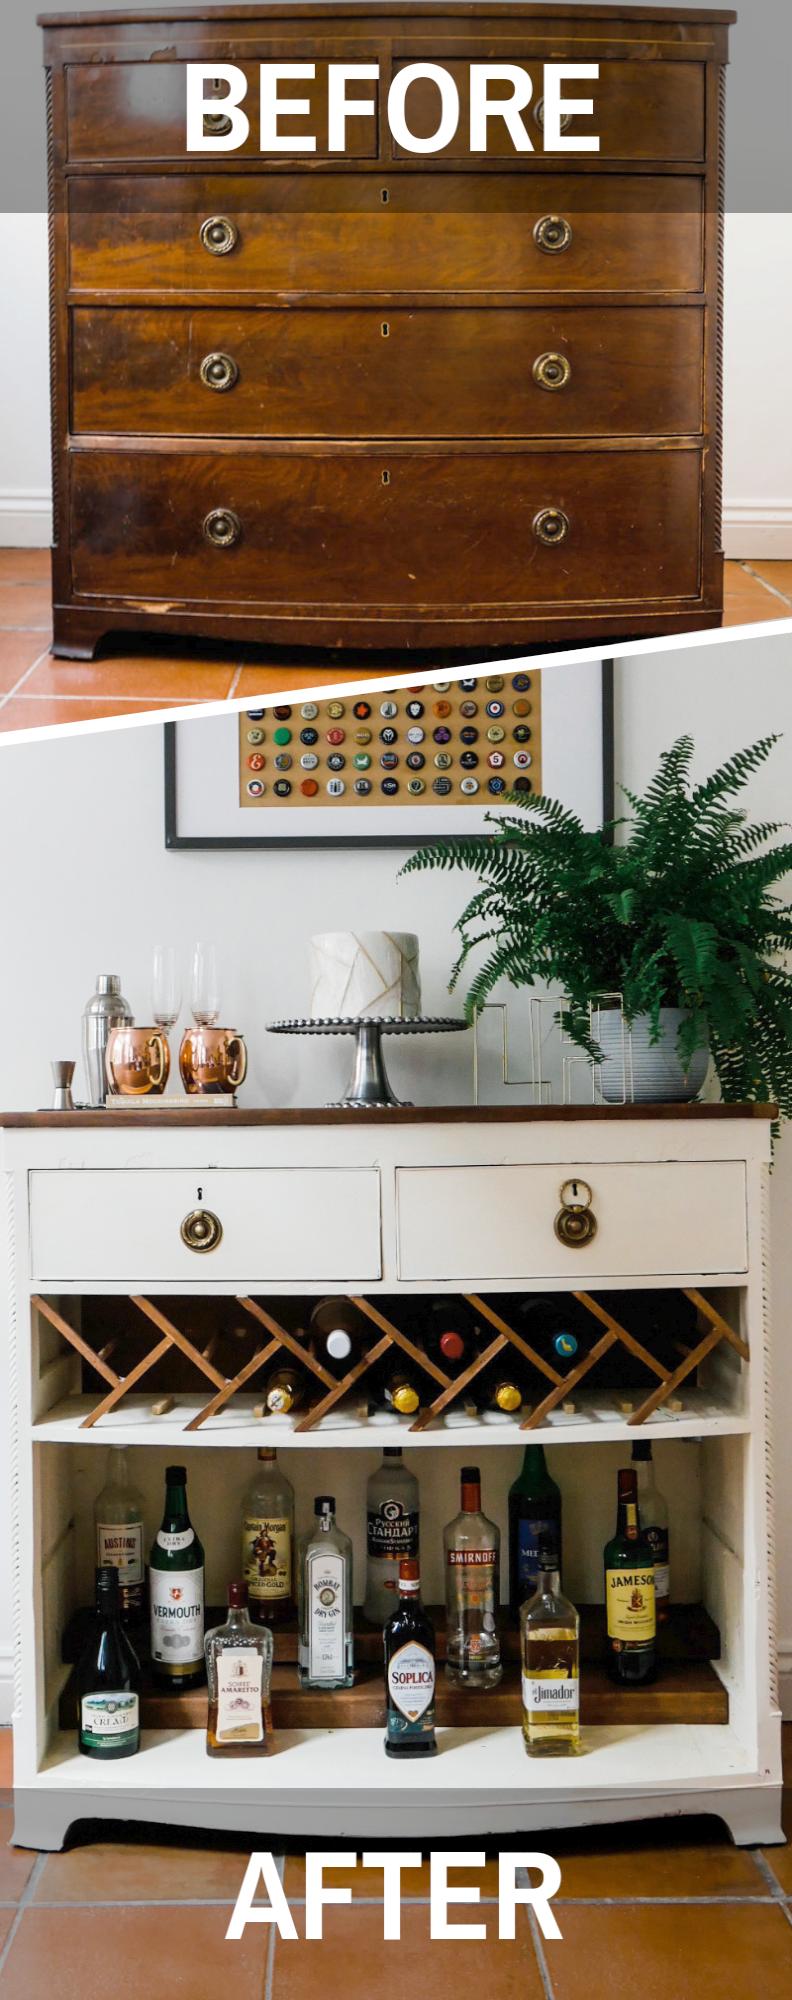 Furniture Row Off Furniture Stores Palm Desert Half Online Furniture Stores Los Angeles Nor Modern Furni Home Bar Cabinet Wine Cabinet Furniture Home Bar Decor